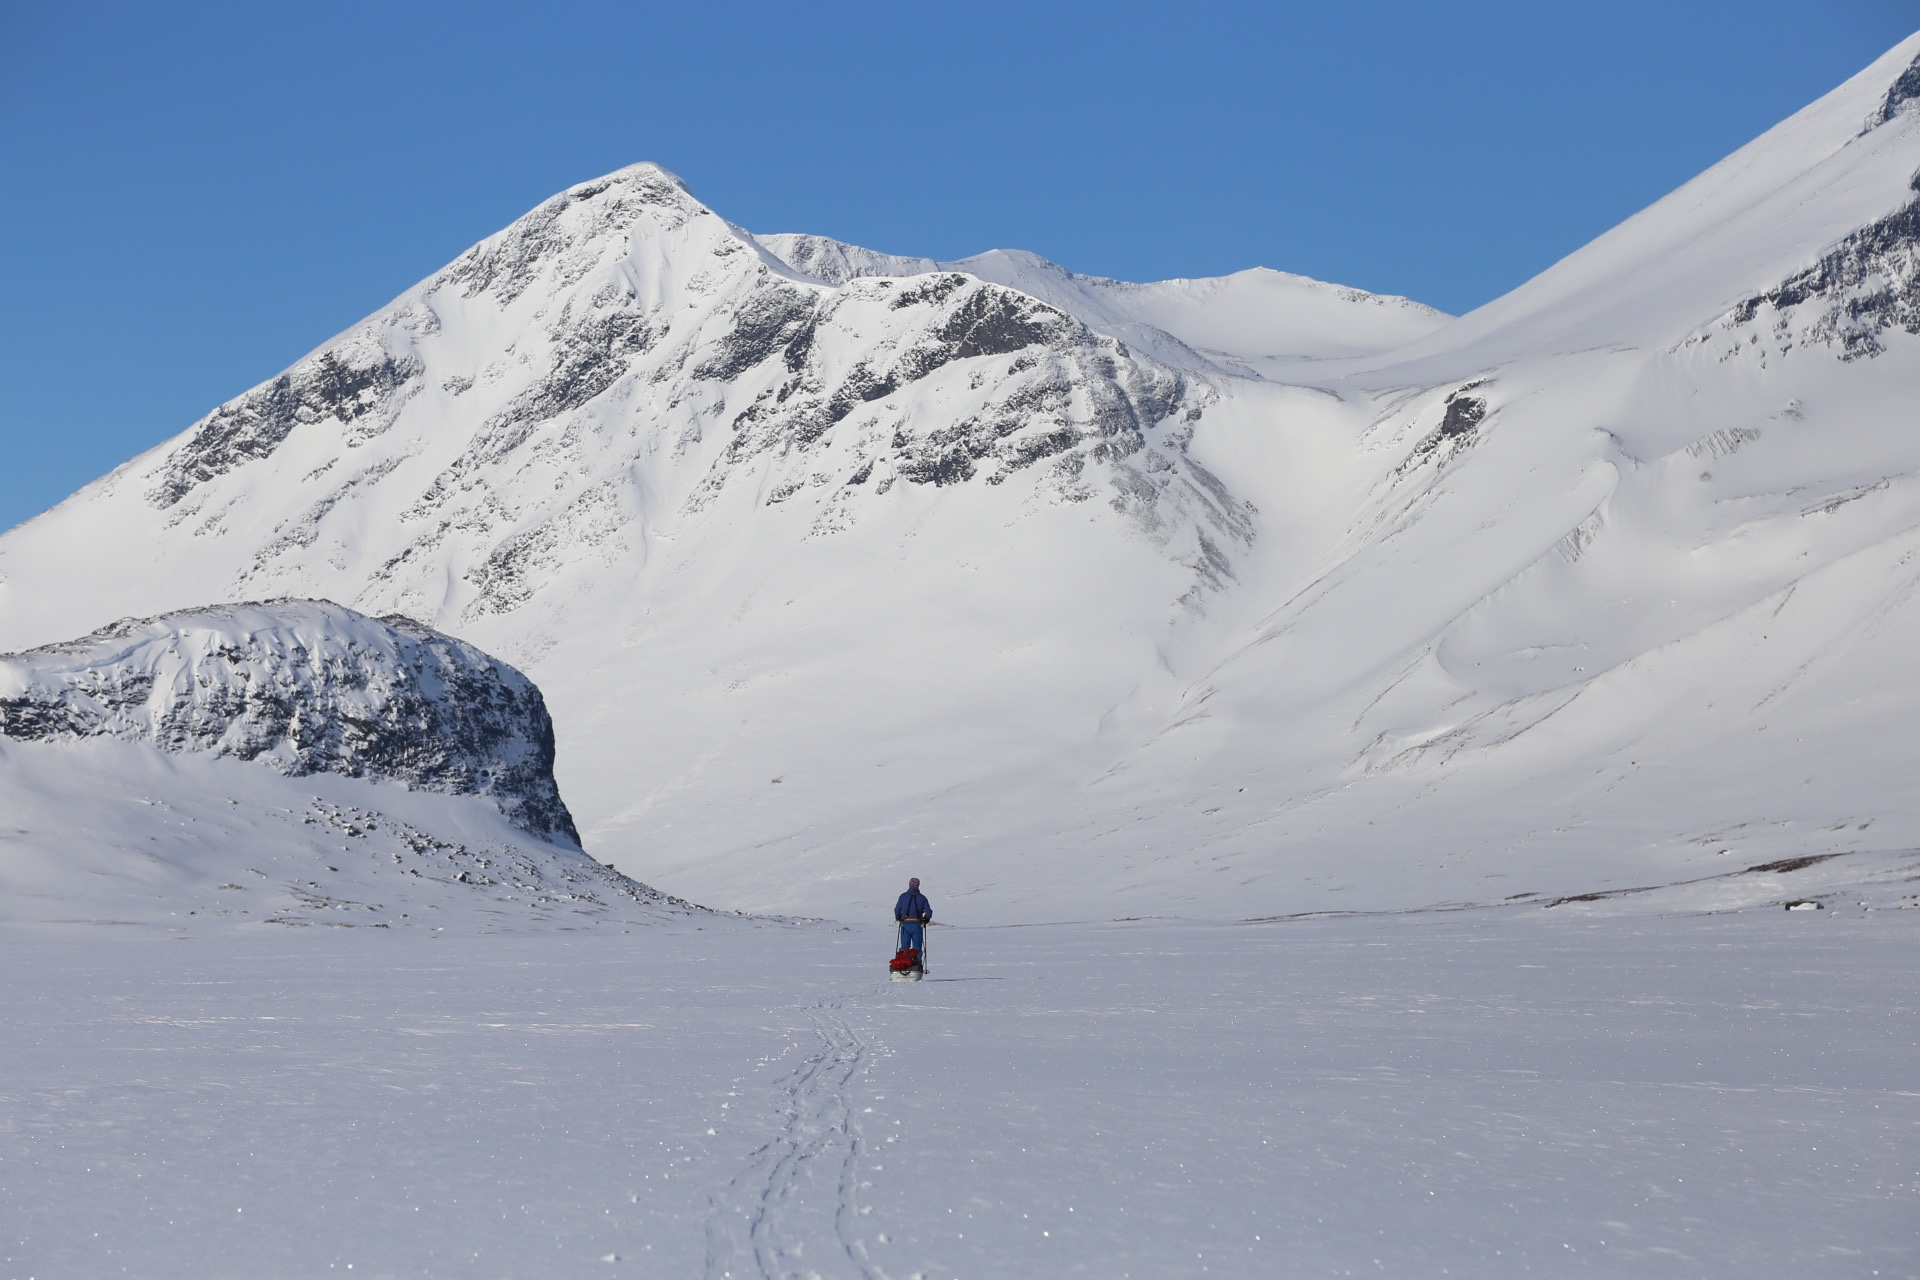 Vintertur i Sarek: Den mäktiga Rapadalen